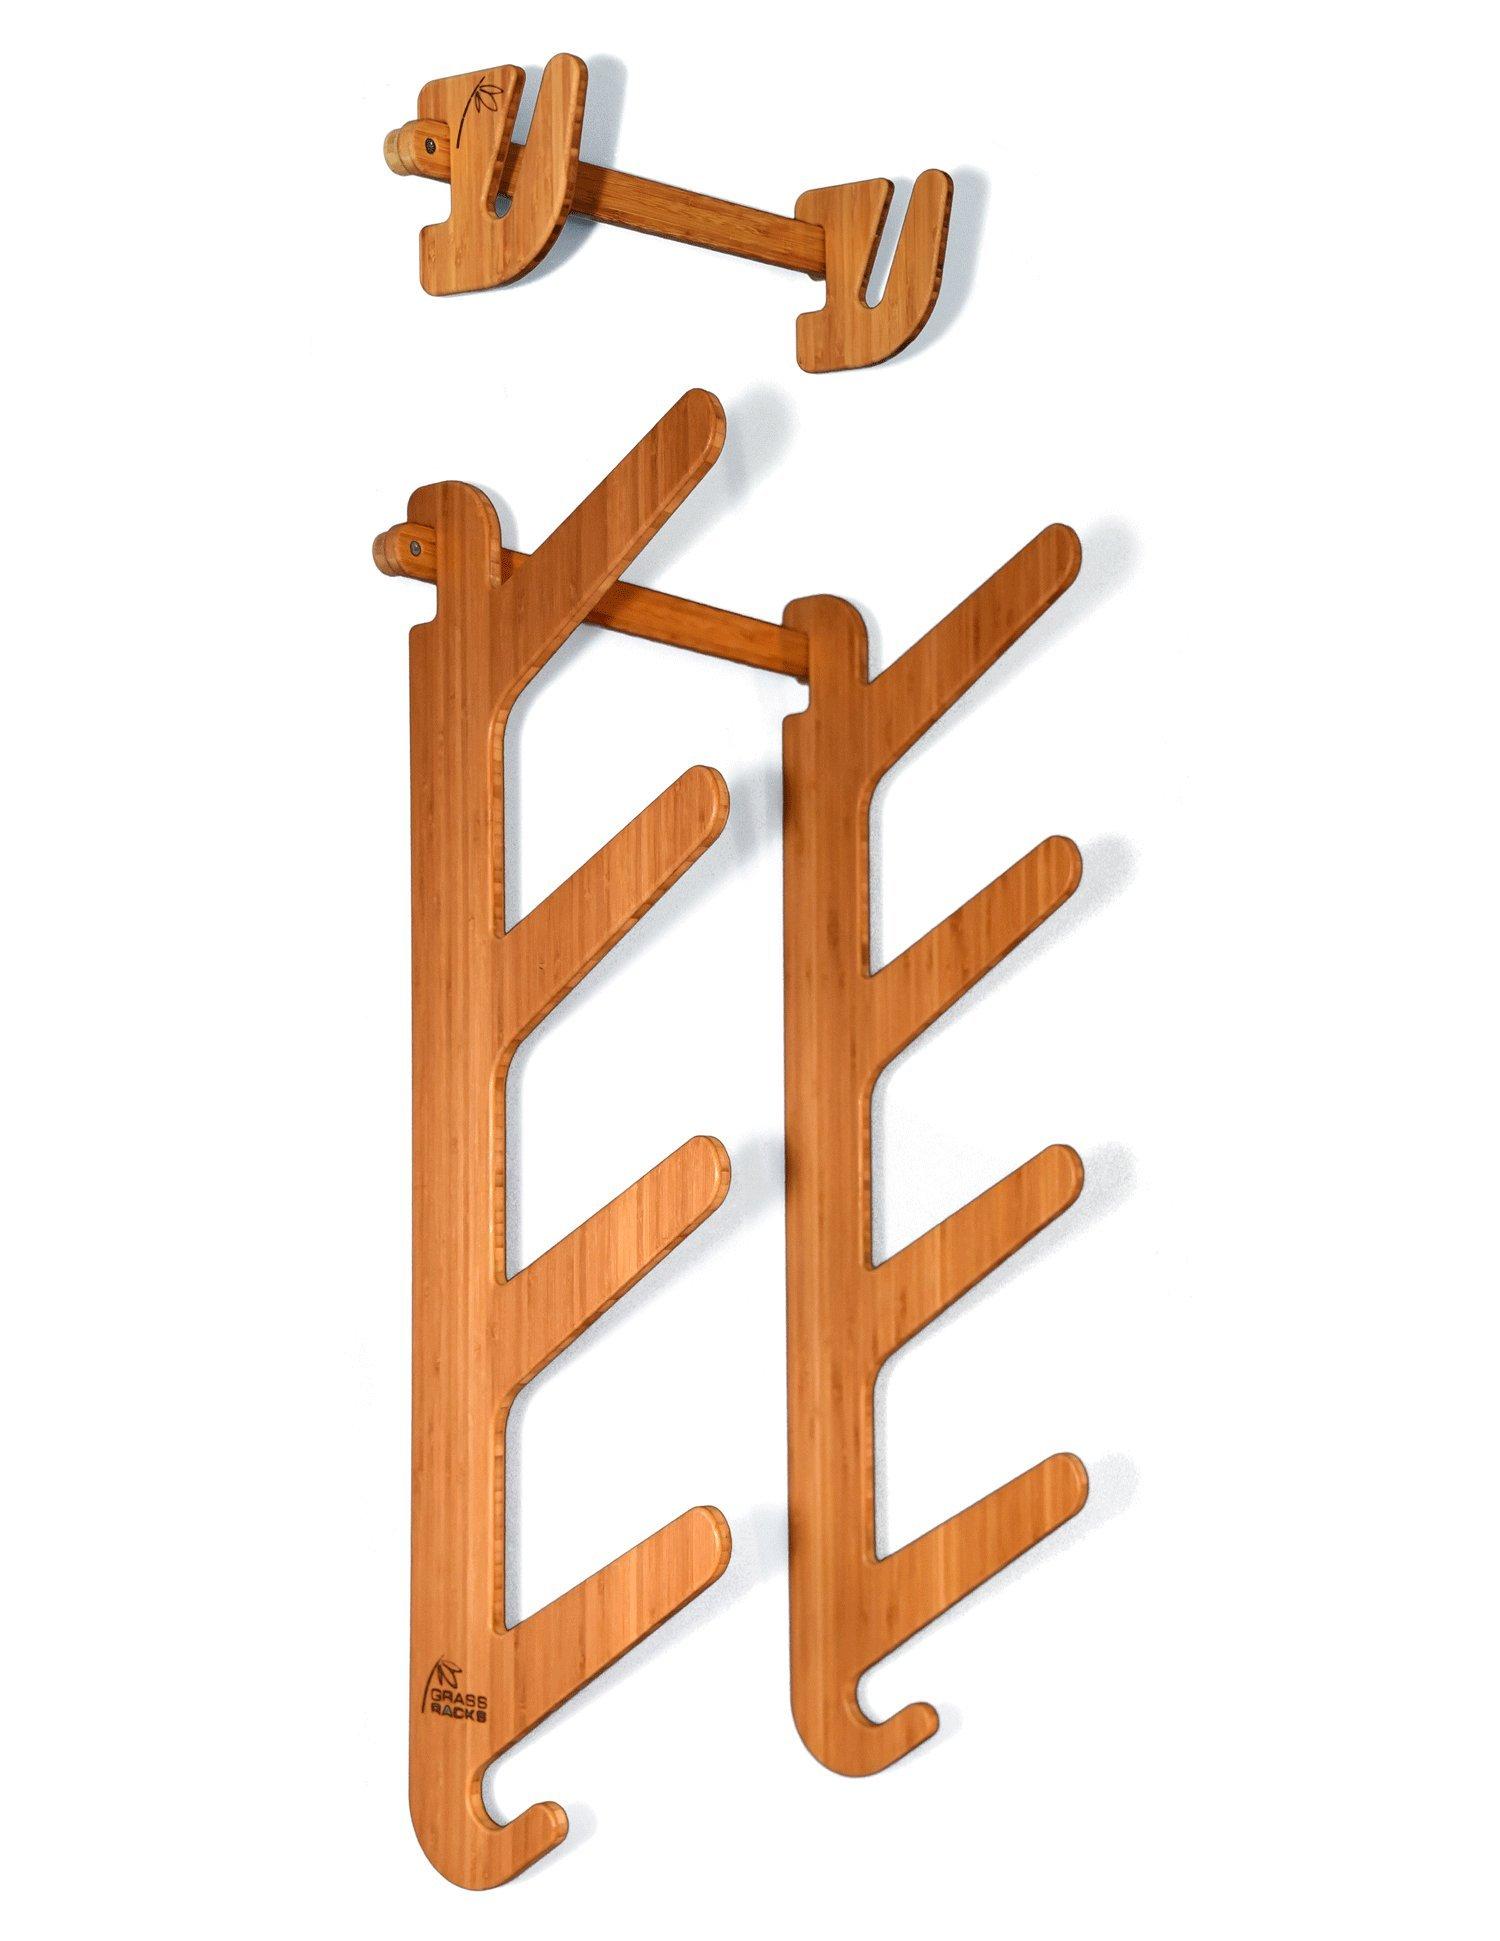 Bamboo Snowboard Wall Rack for 5 Snowboards or Skateboards - Grassracks Moloka'i Pro Package by Grassracks